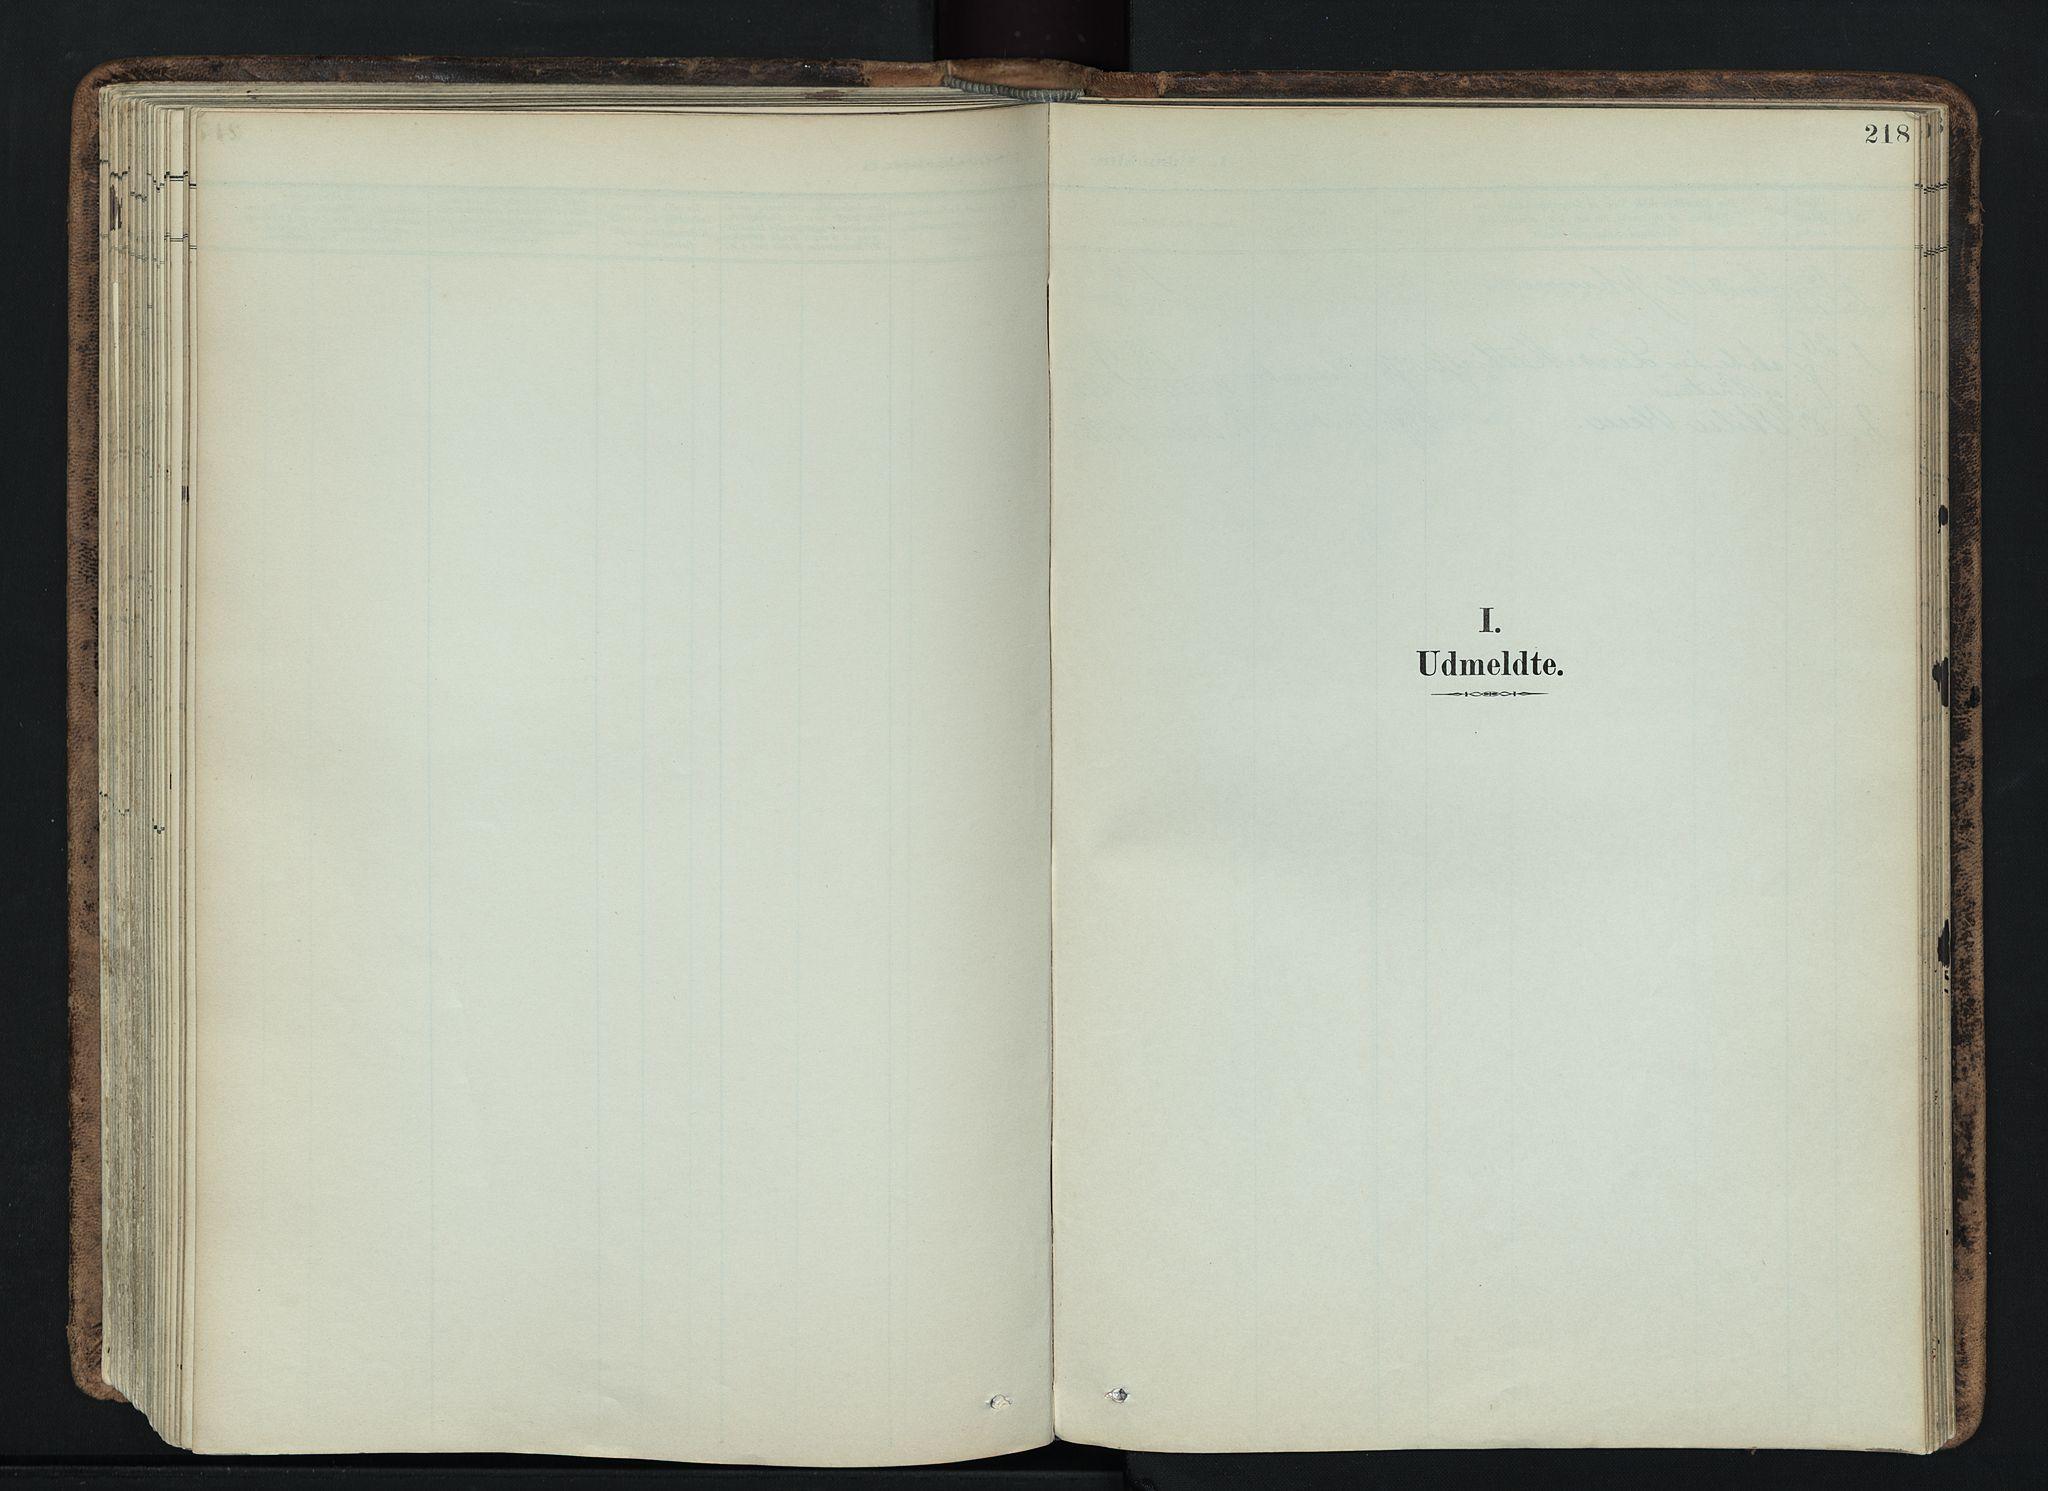 SAH, Vardal prestekontor, H/Ha/Haa/L0019: Ministerialbok nr. 19, 1893-1907, s. 218